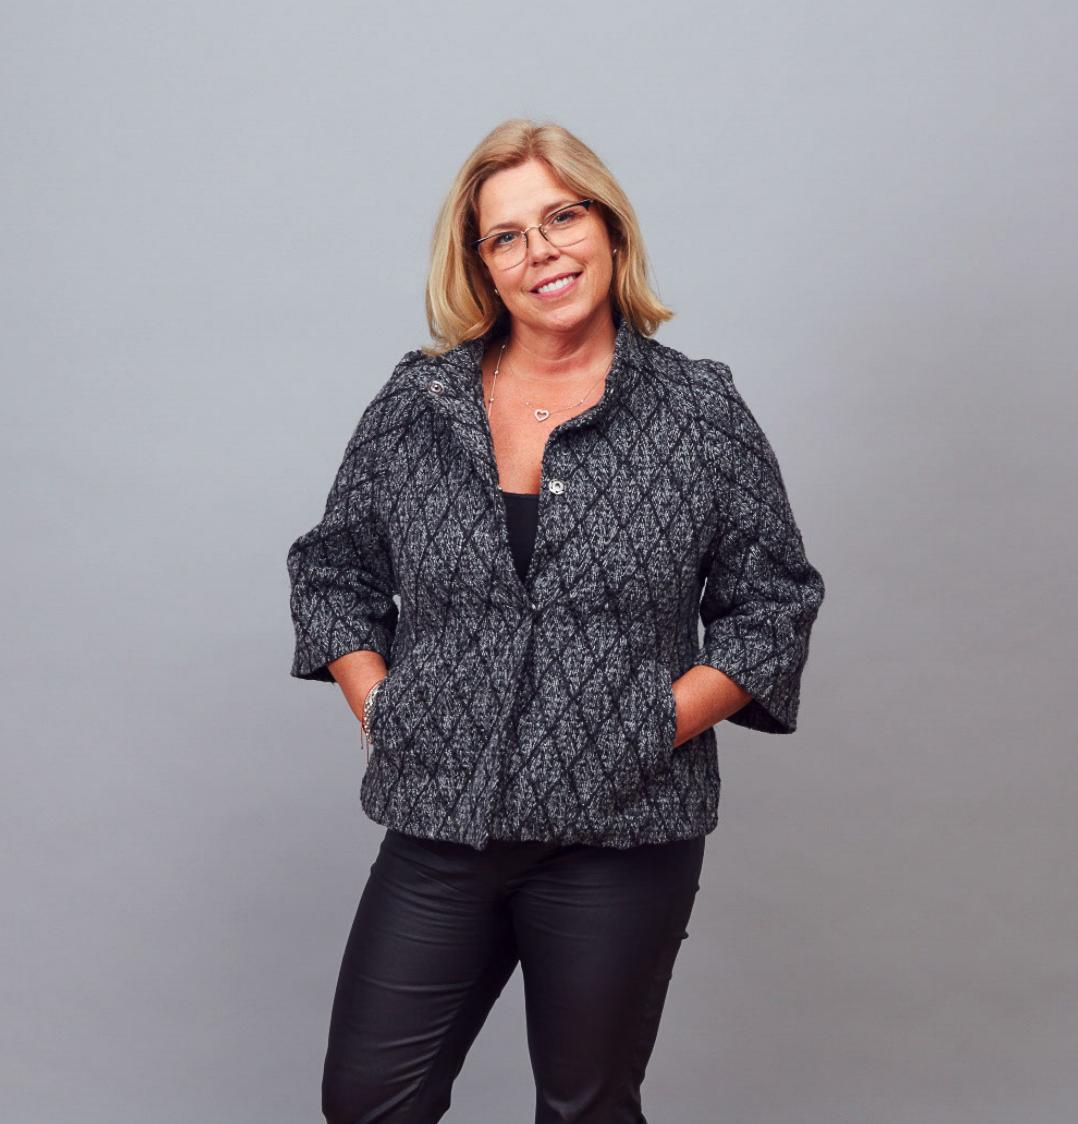 Deborah Ward, Managing Director of Camm & Hooper